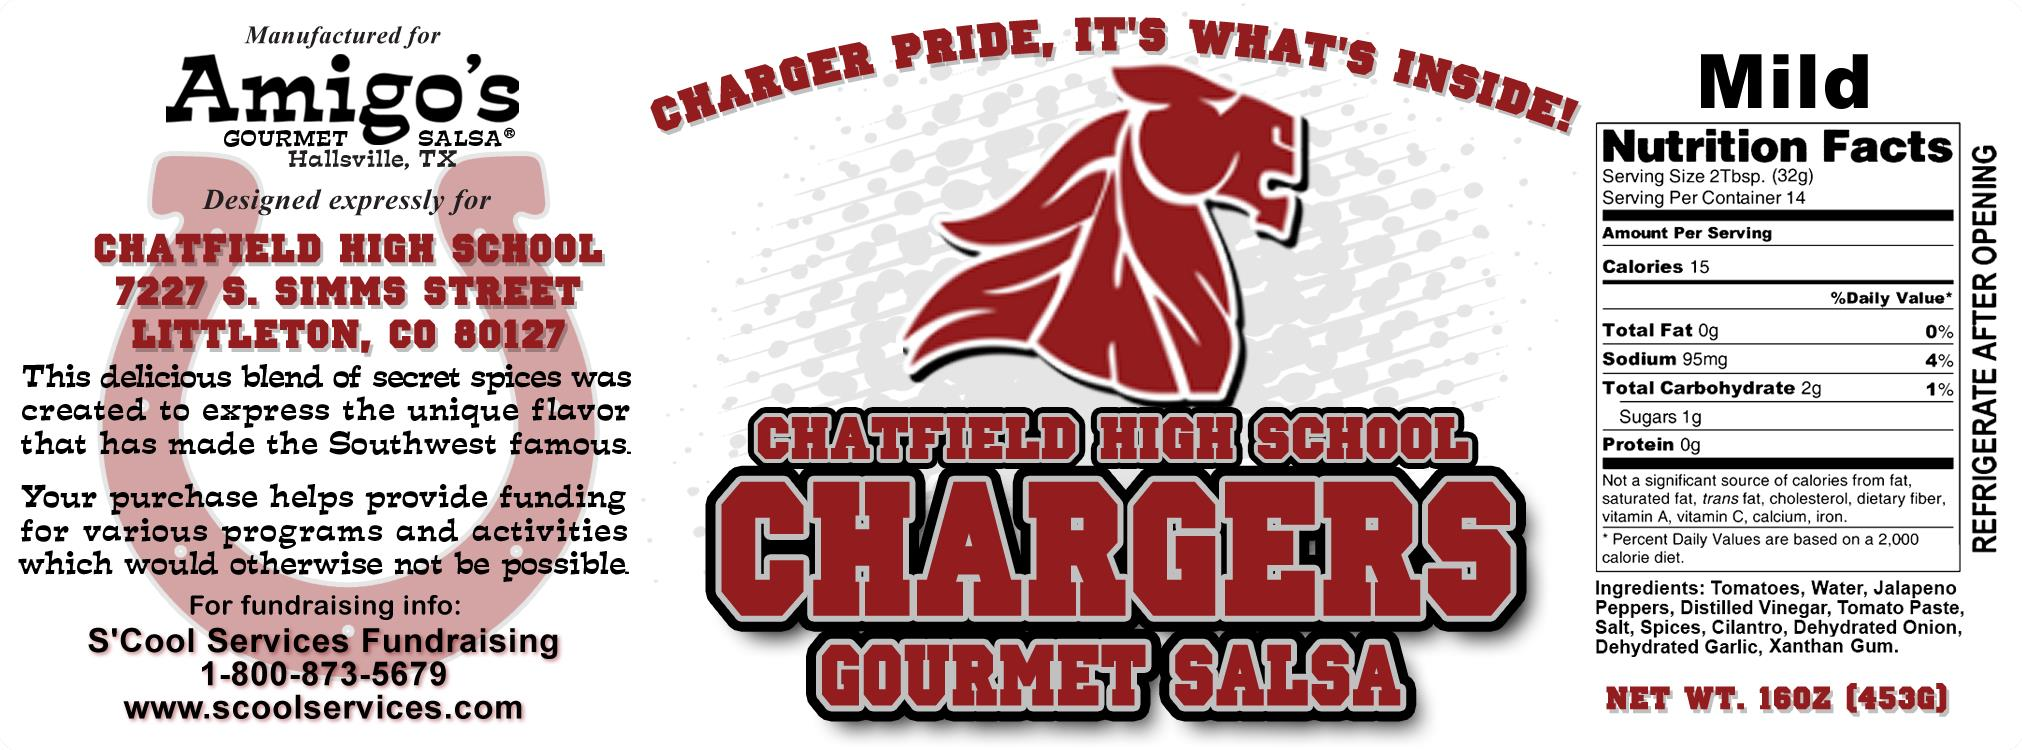 Chatfield High School Cheer Chargers Jar MILD.jpg